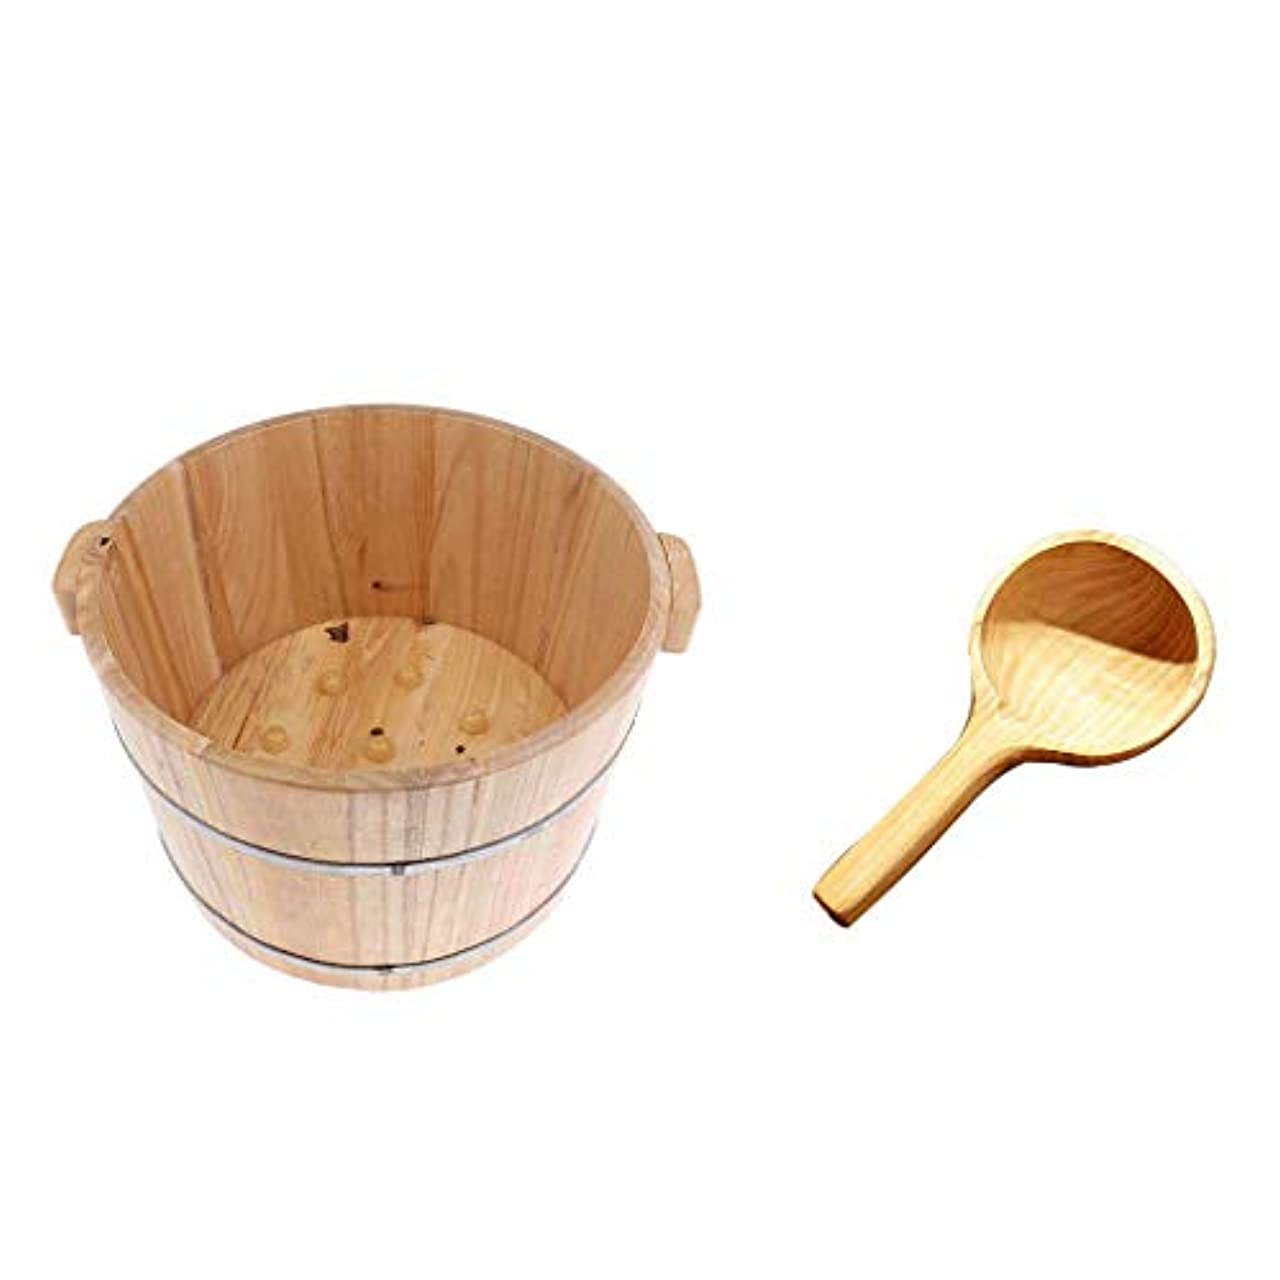 dailymall フットスパバスベイスンバスタブフィート浸漬洗浄バケツバレルW/ウッドウォータースクープ